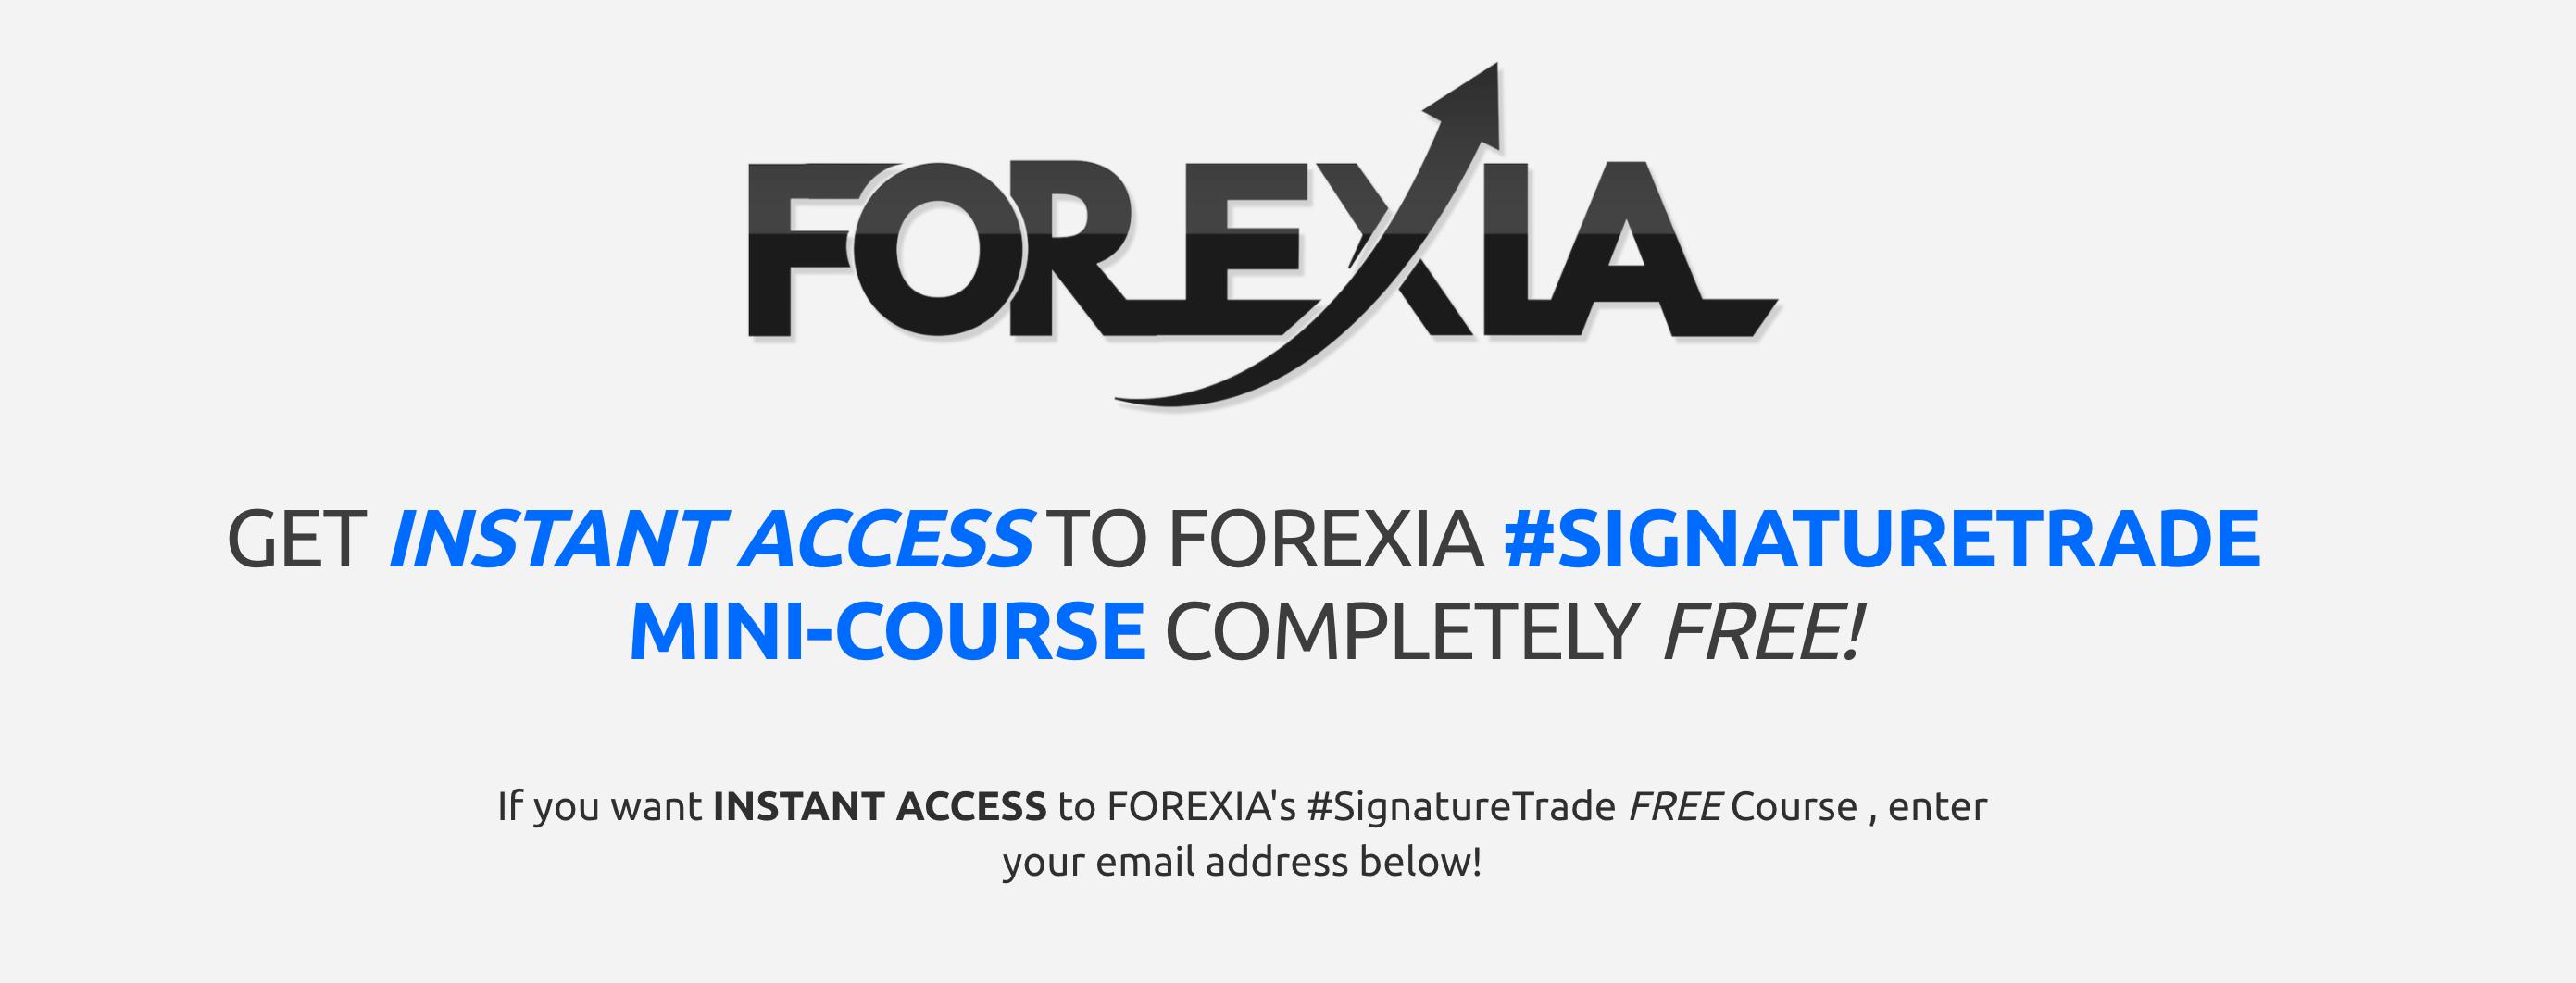 Free Forexia Signature Trade Course